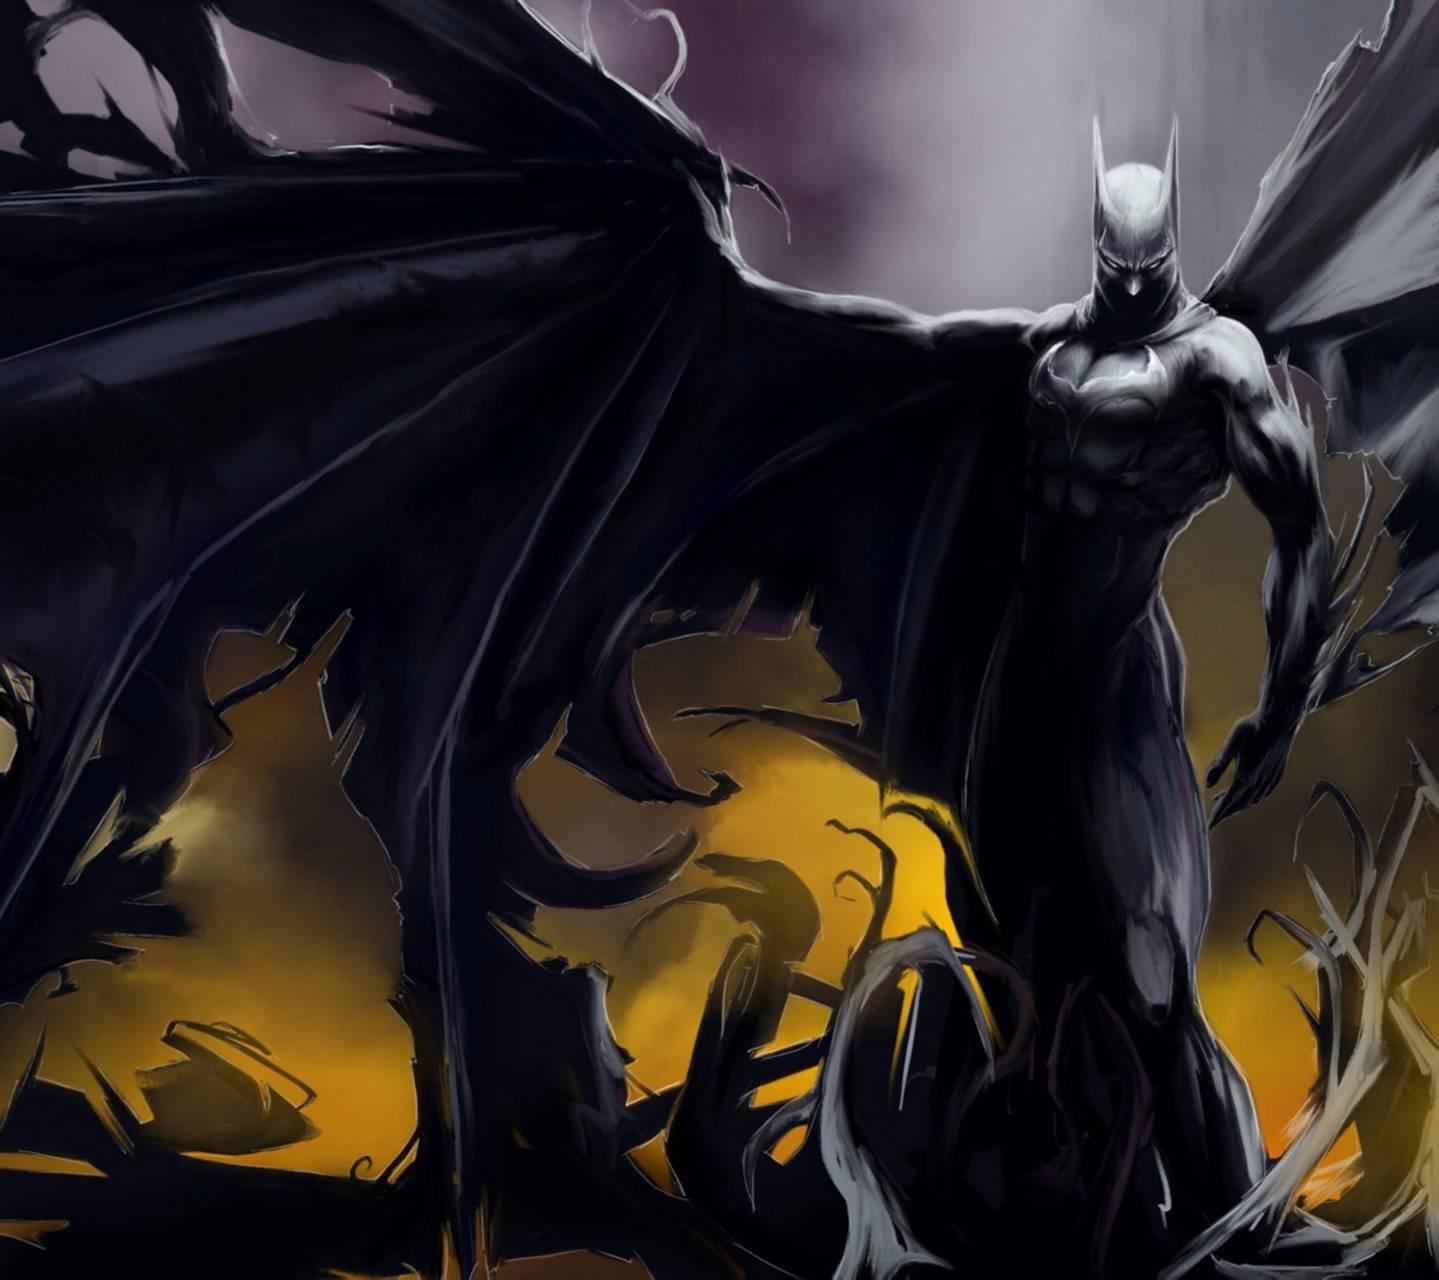 Dark Knight paint